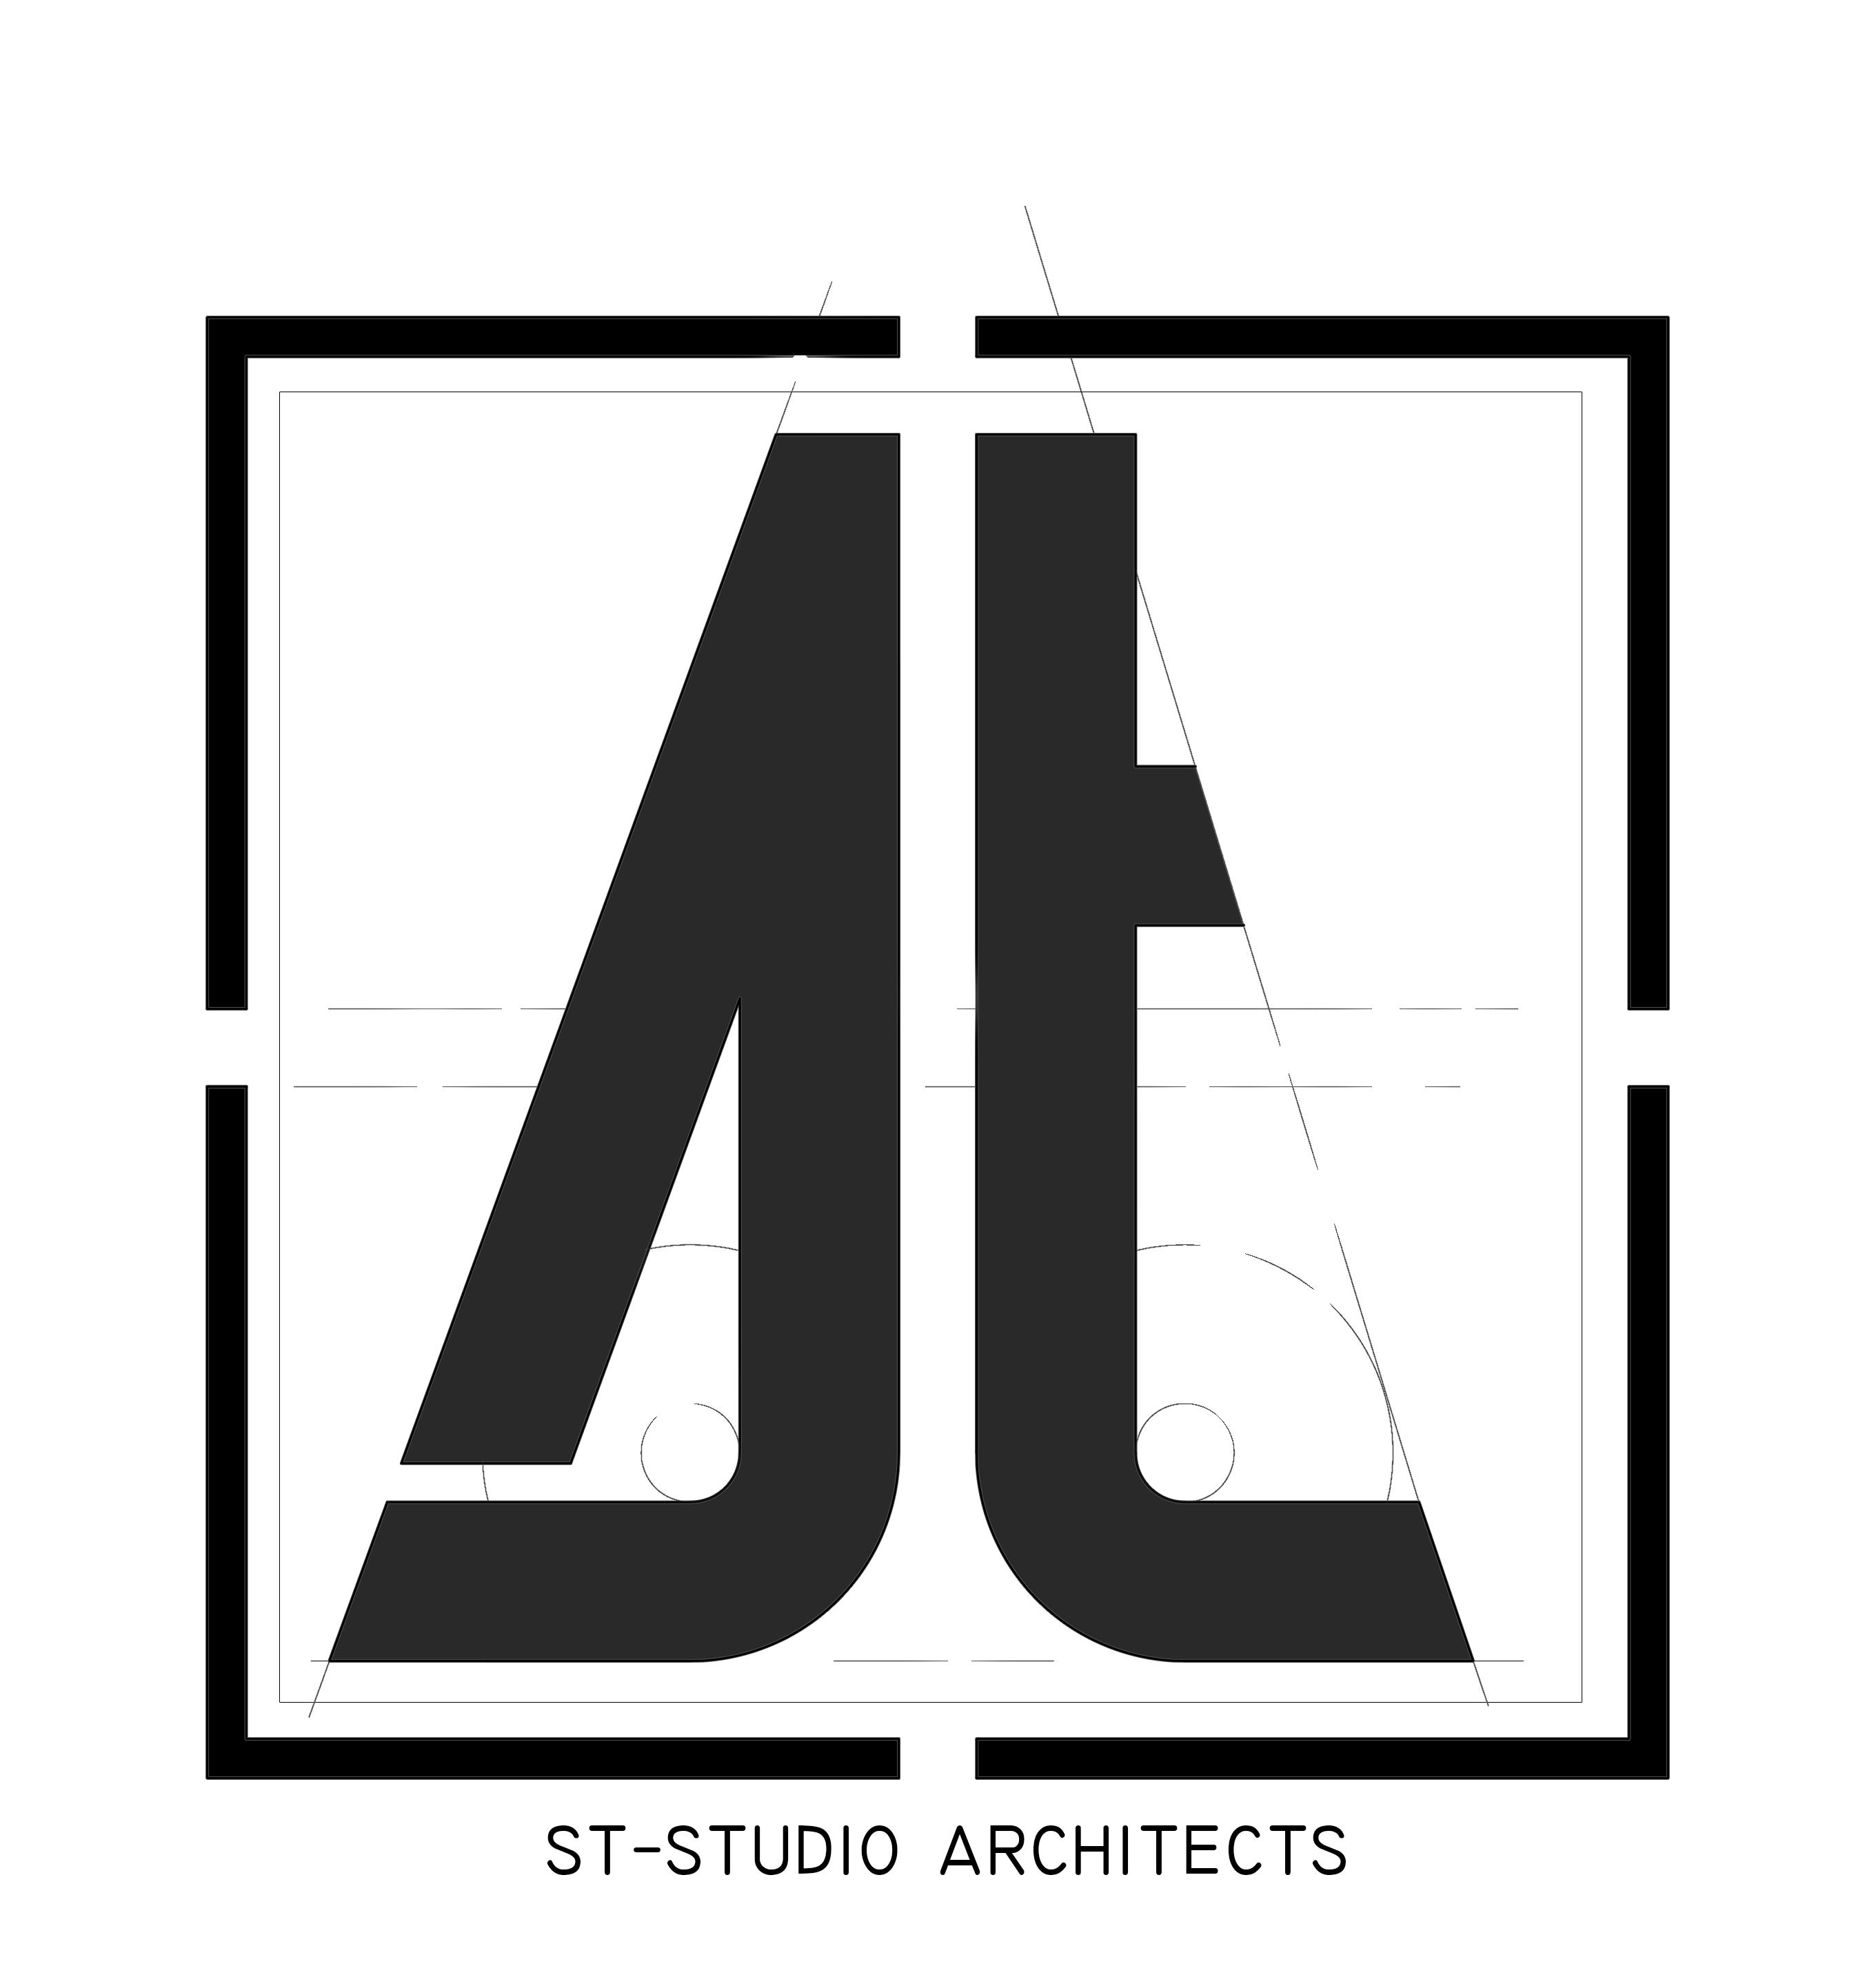 ST-Studio